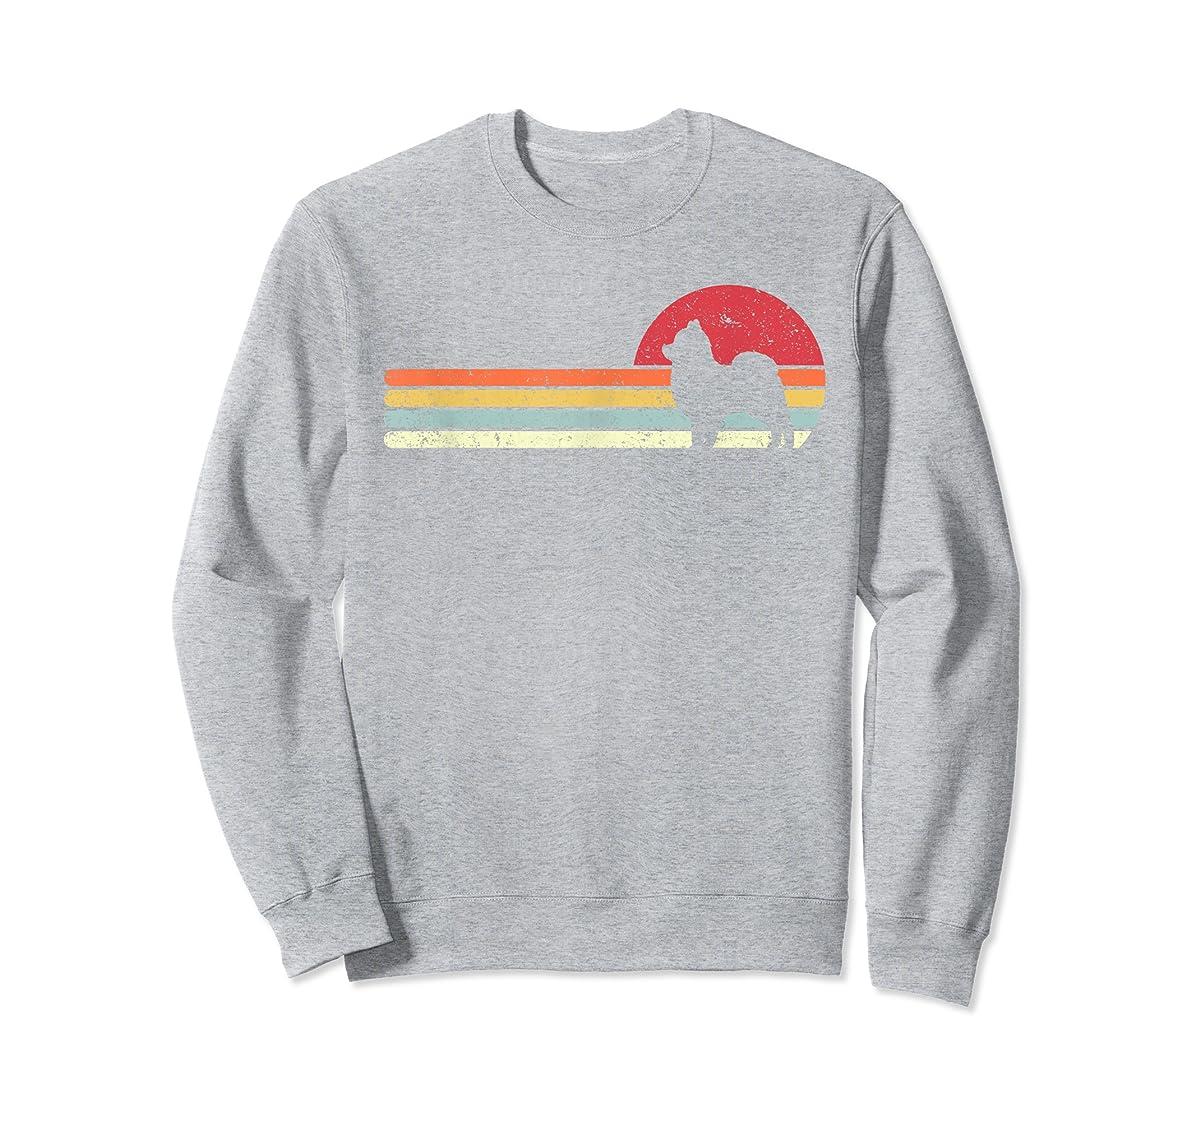 Pomeranian Shirt. Retro Style T-Shirt-Sweatshirt-Sport Grey